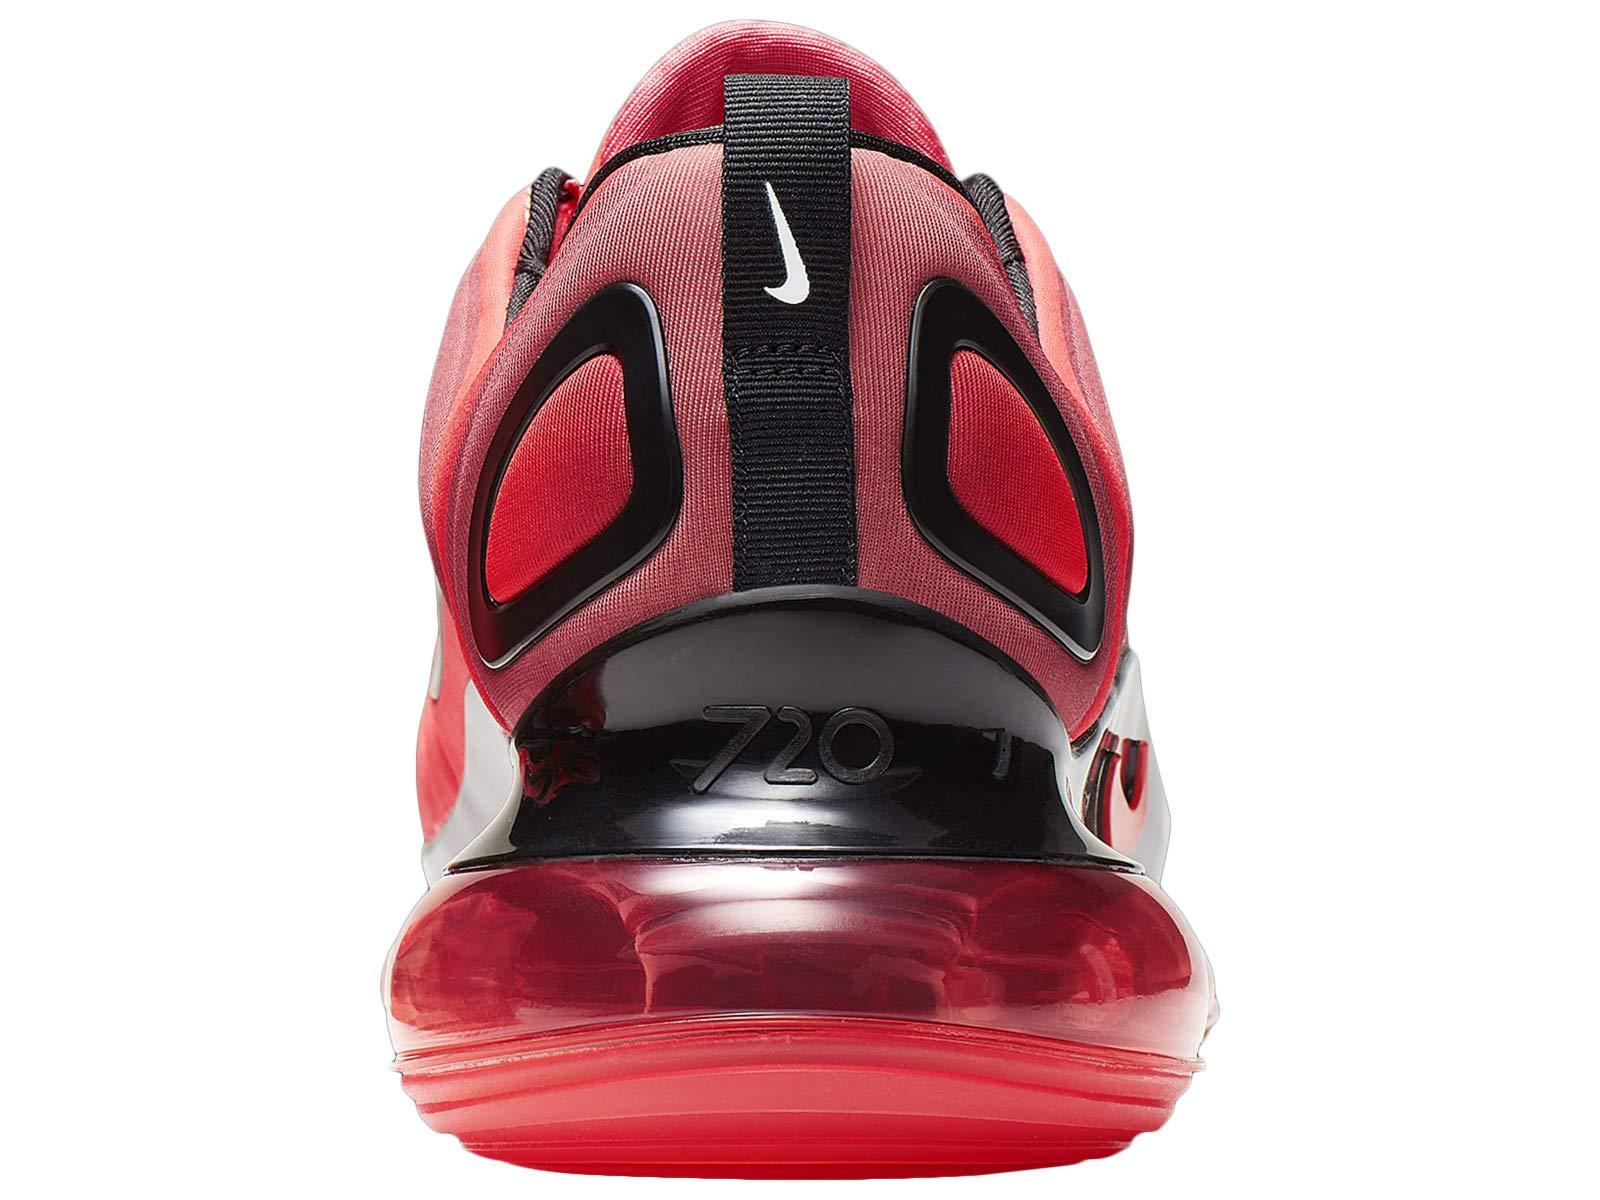 71X1%2B5 lbdL - Nike Men's Air Max 720 Bright Crimson/Black/Ember Glow Mesh Running Shoes 10 M US